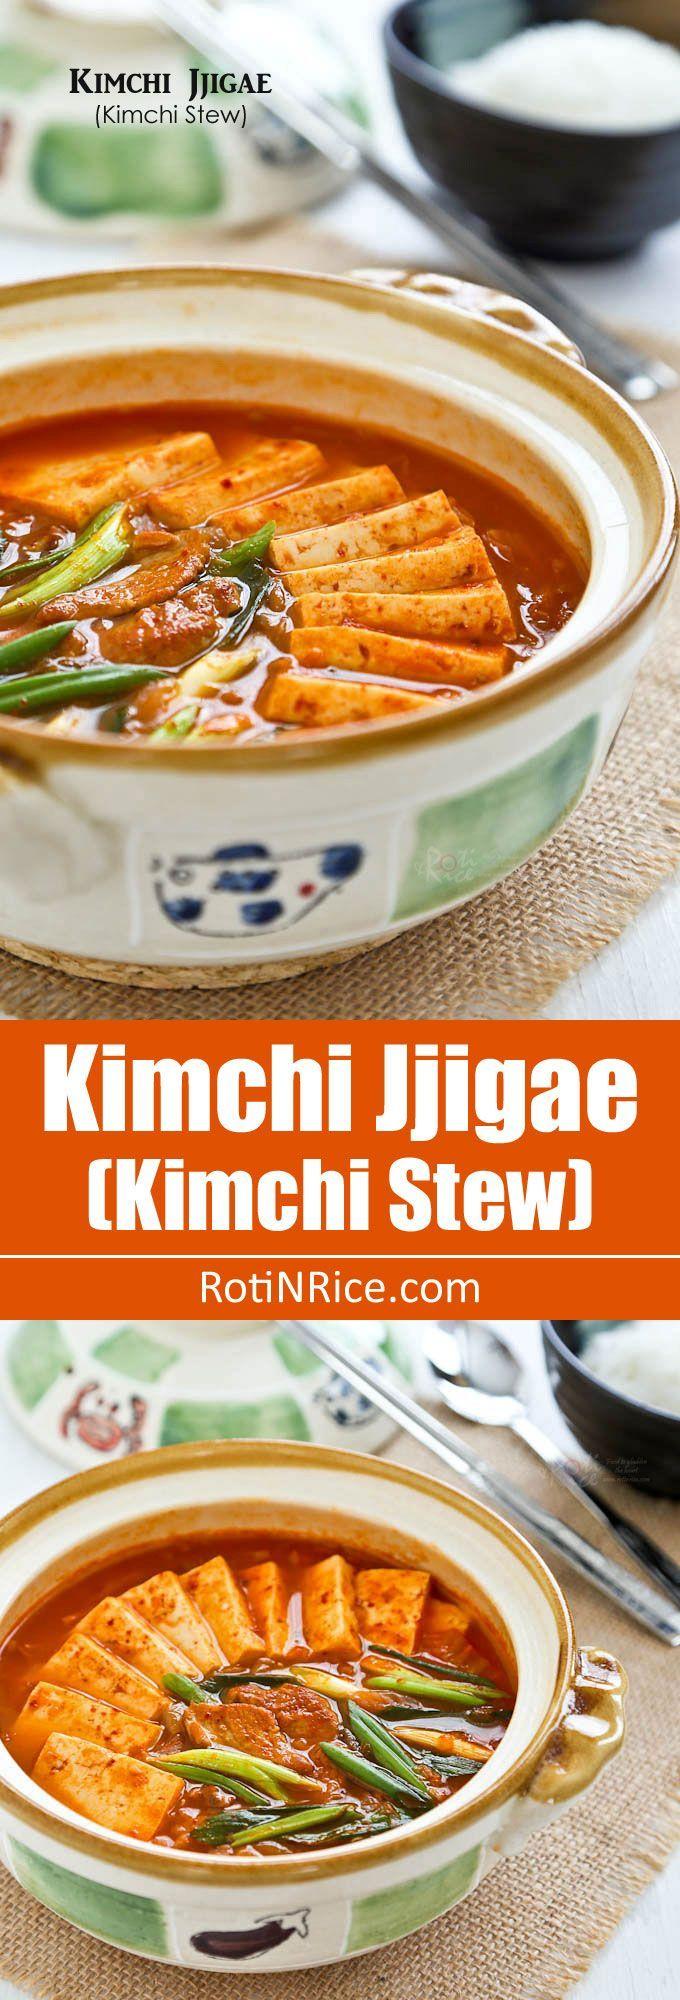 Kimchi Jjigae (Kimchi Stew), a popular spicy Korean stew made with ...